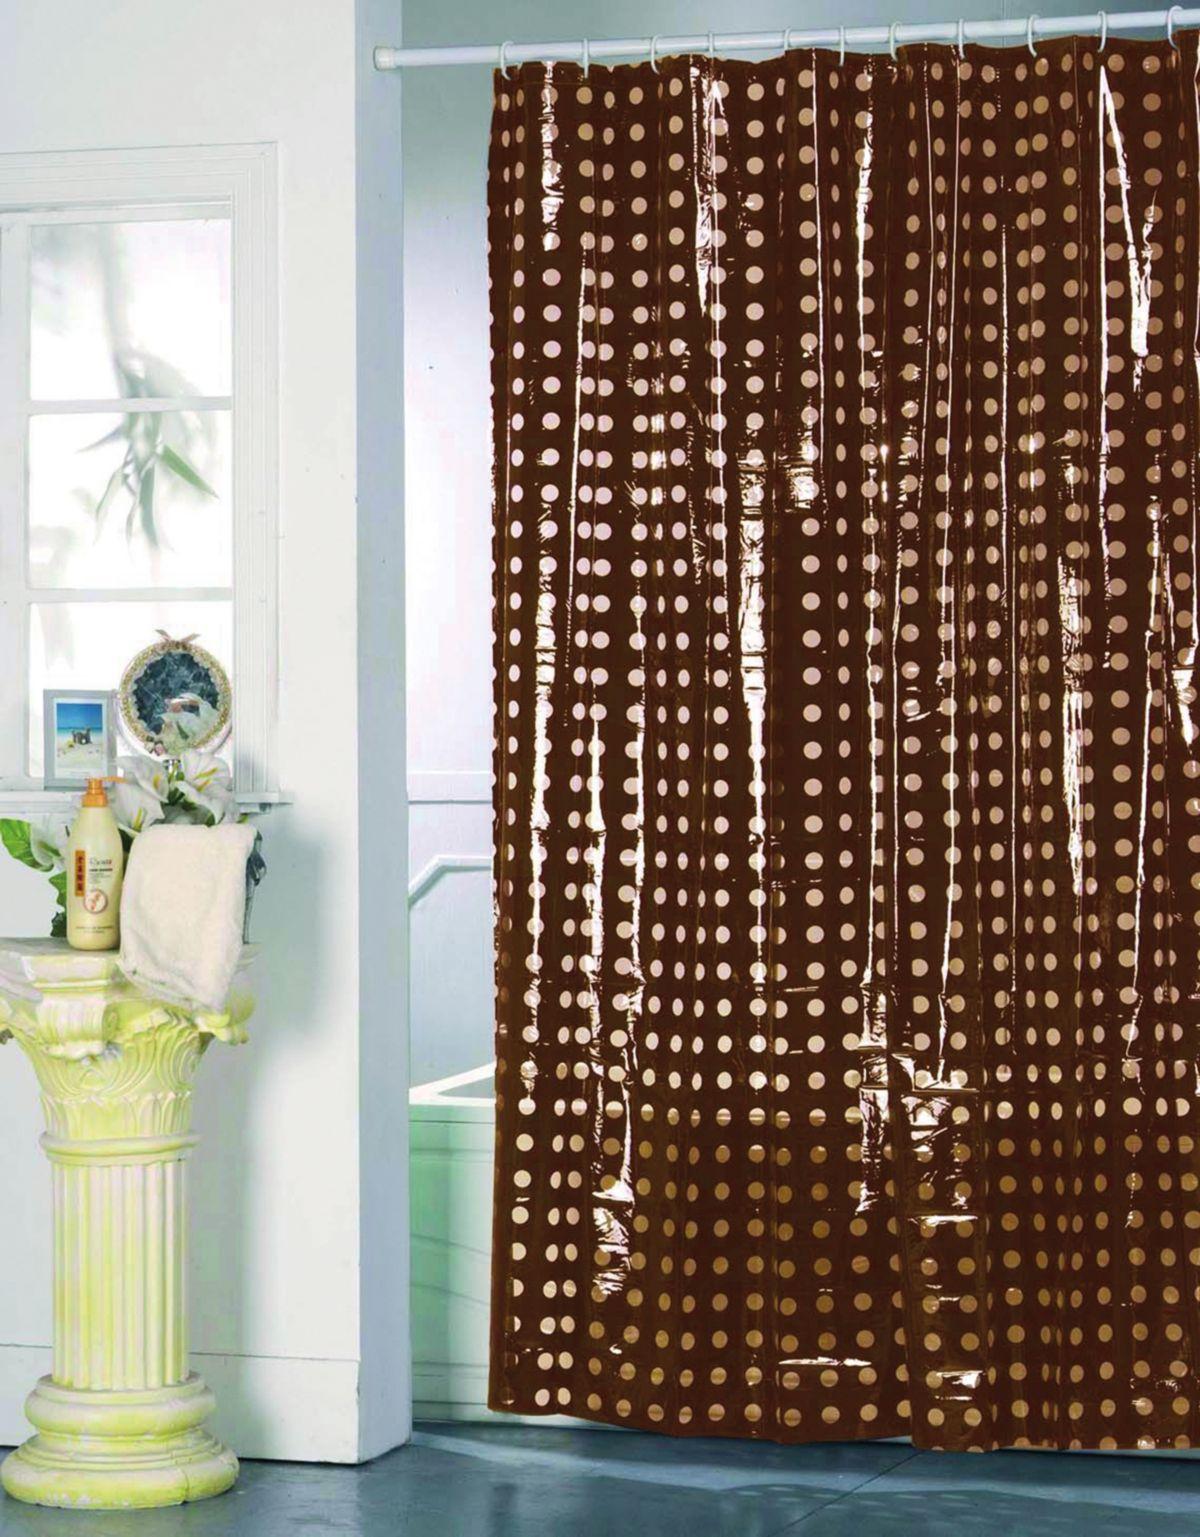 Duschvorhang seite 11 preisvergleich for Butlers duschvorhang